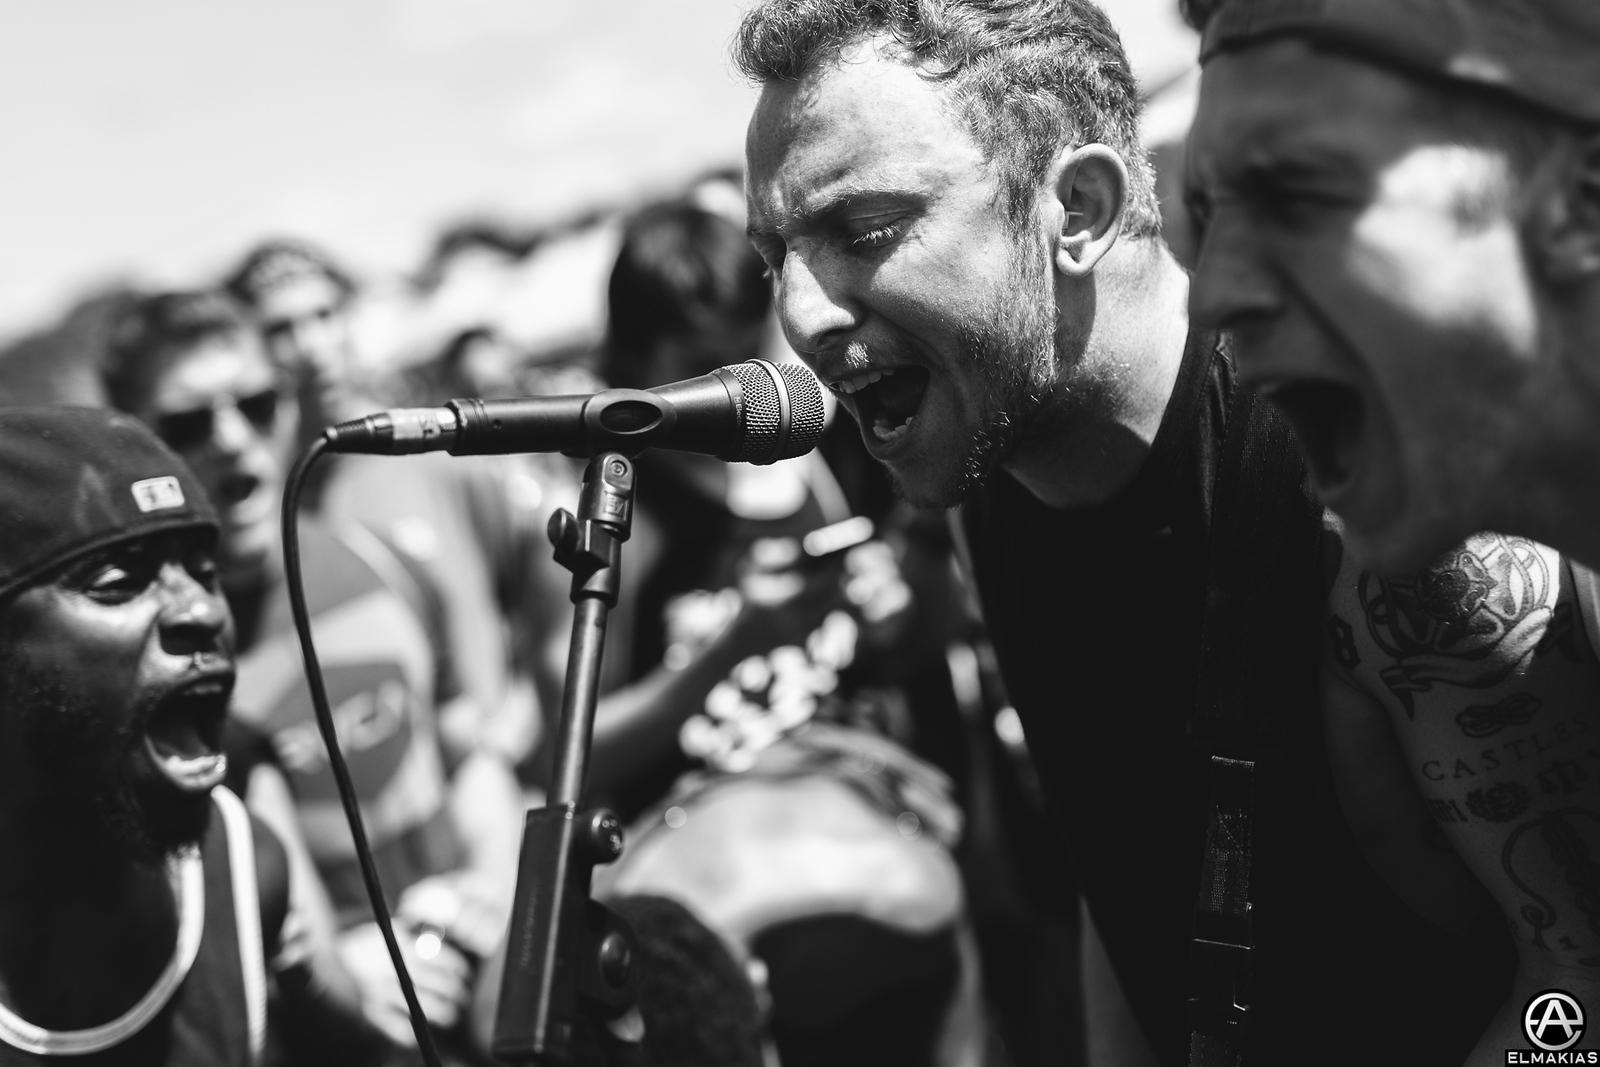 Mat Welsh of While She Sleeps at Vans Warped Tour 2015 by Adam Elmakias